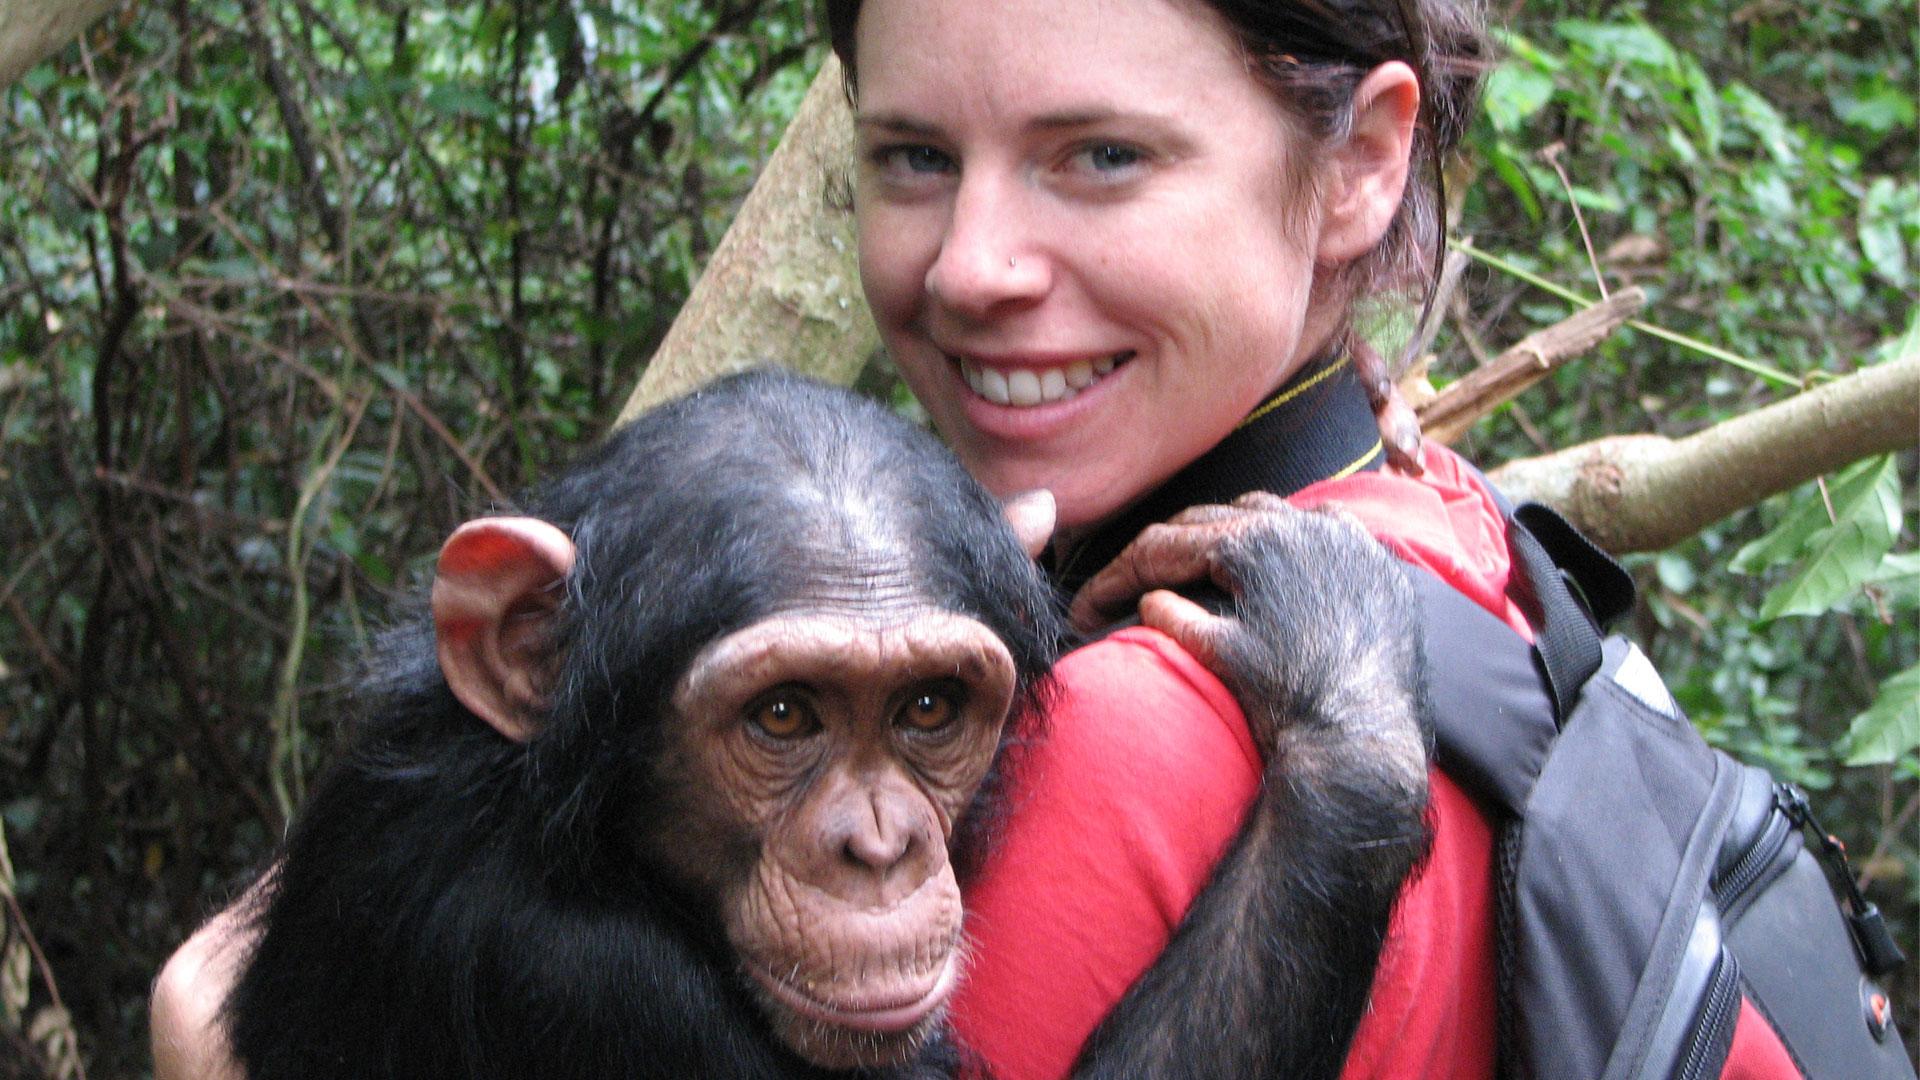 https://rfacdn.nz/zoo/assets/media/mikaylie-chimp-congo-gallery-3.jpg